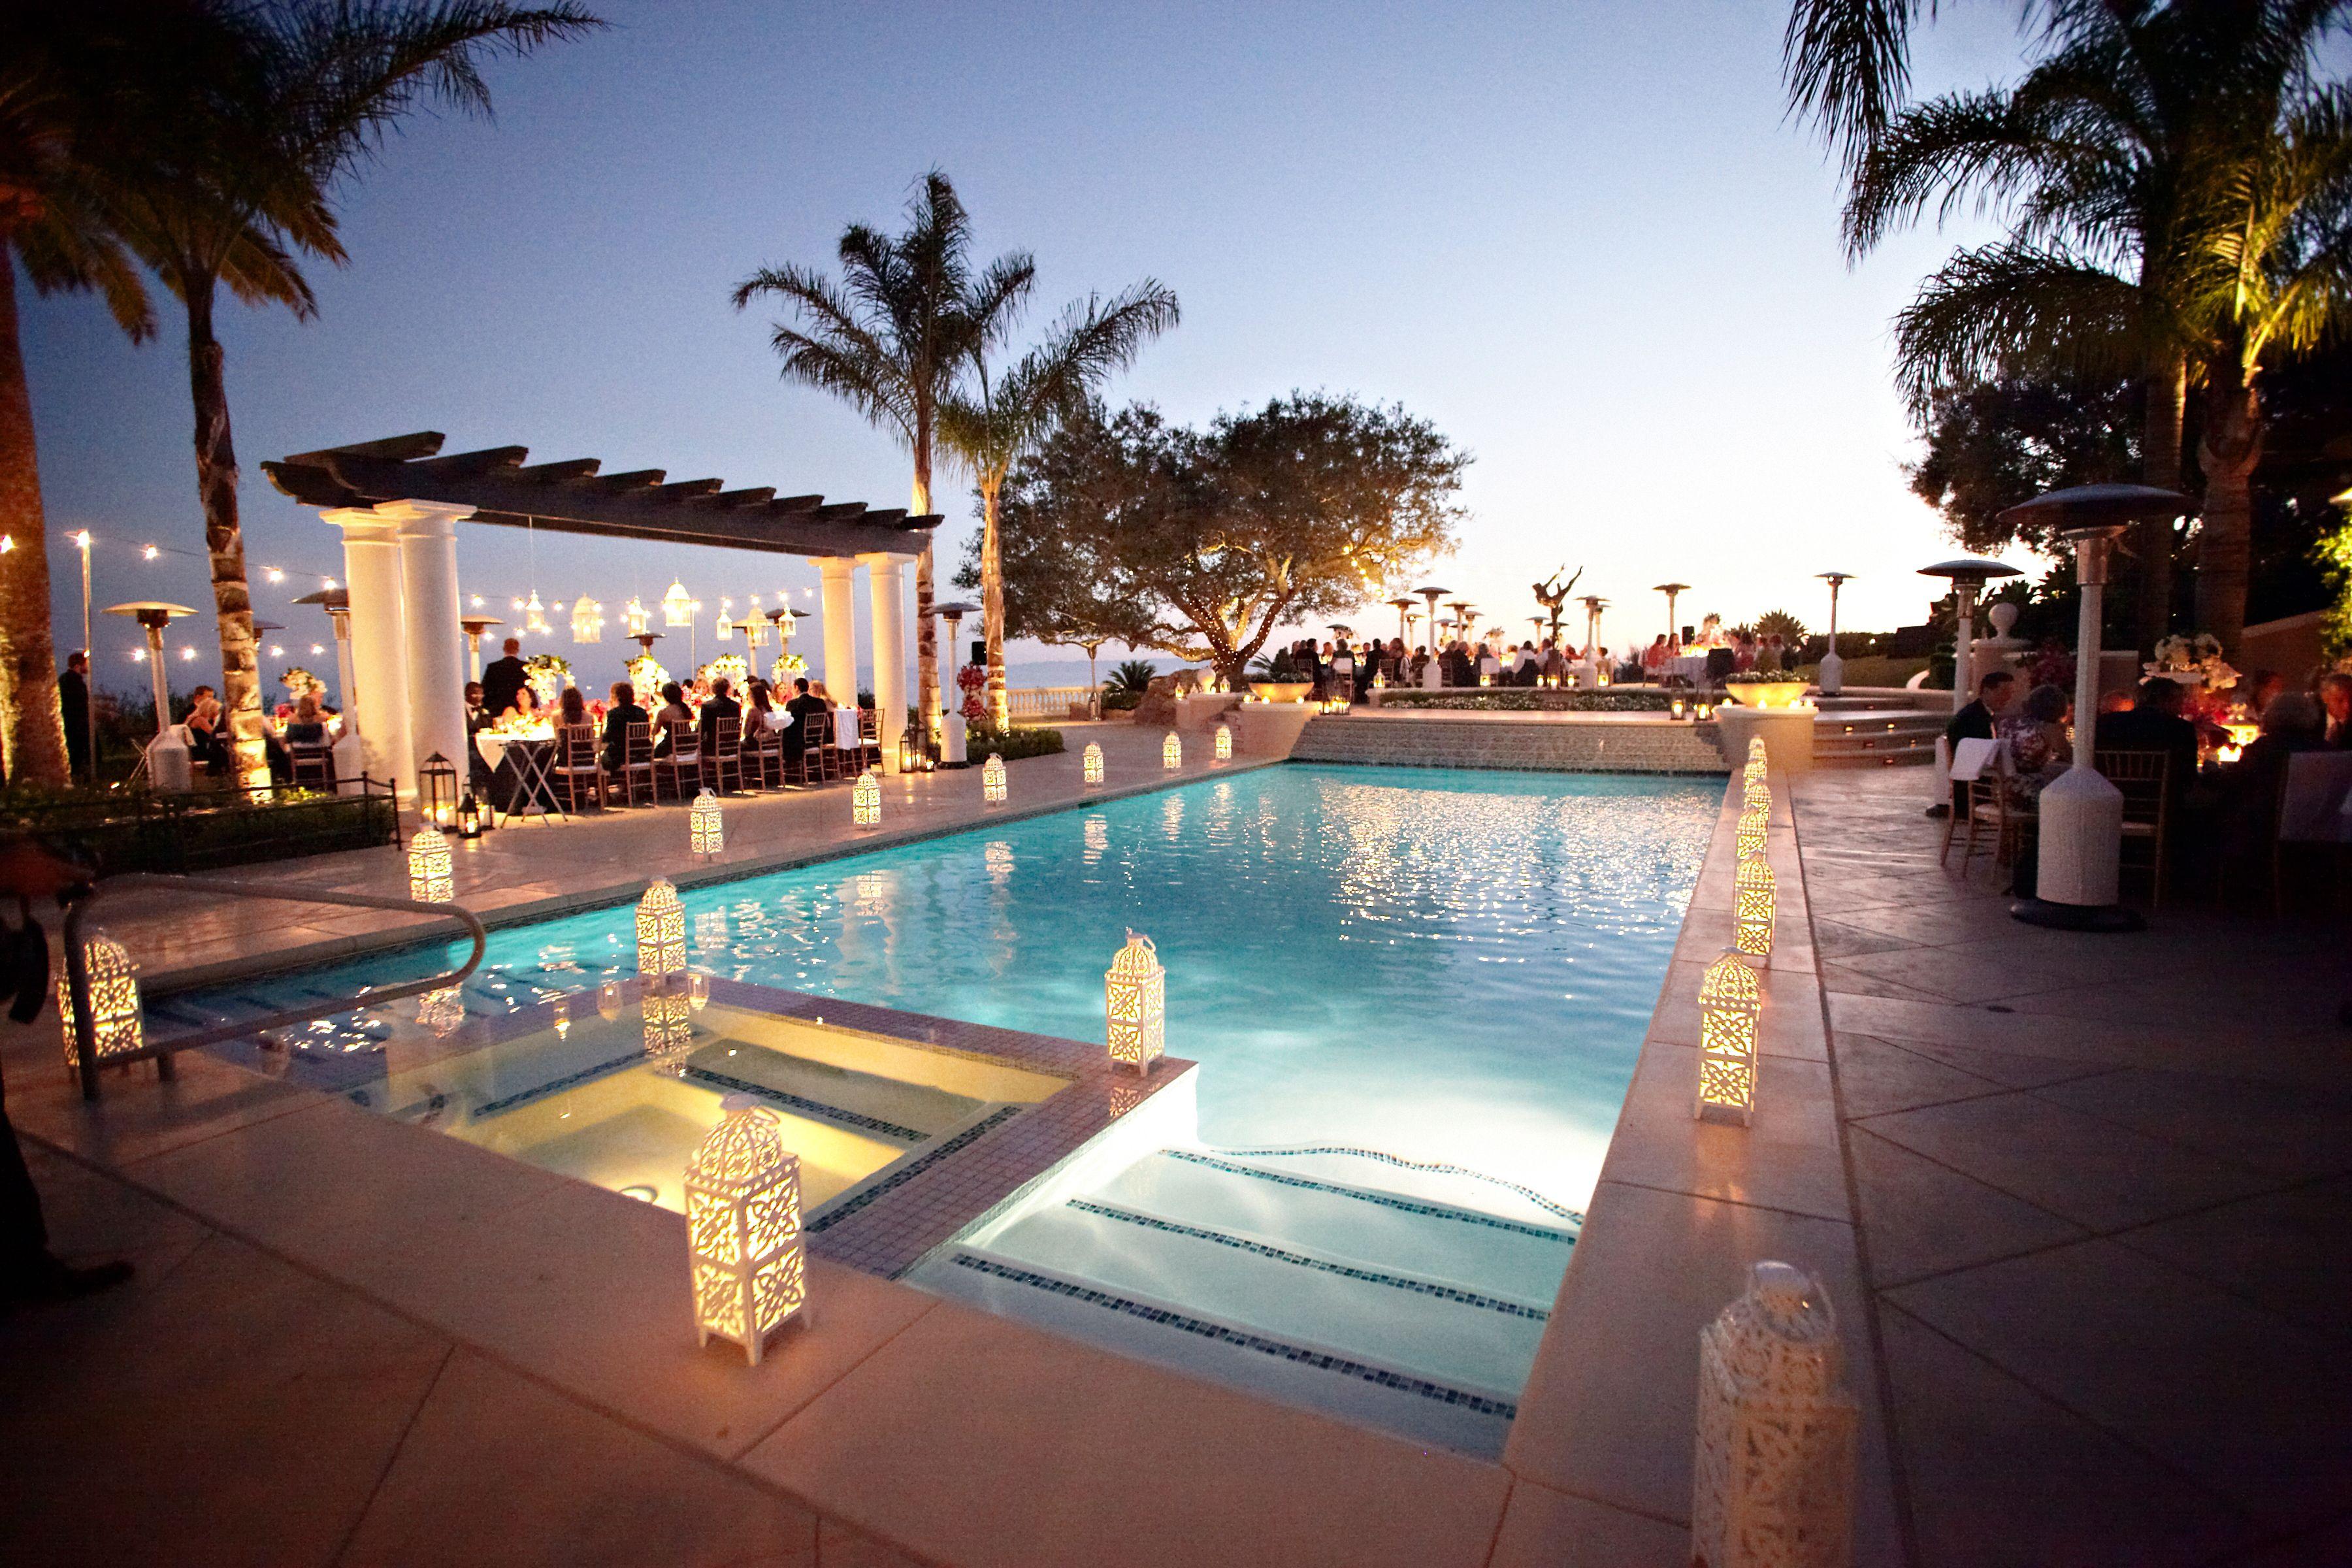 poolside wedding - Google Search   Pool wedding, Pool ...